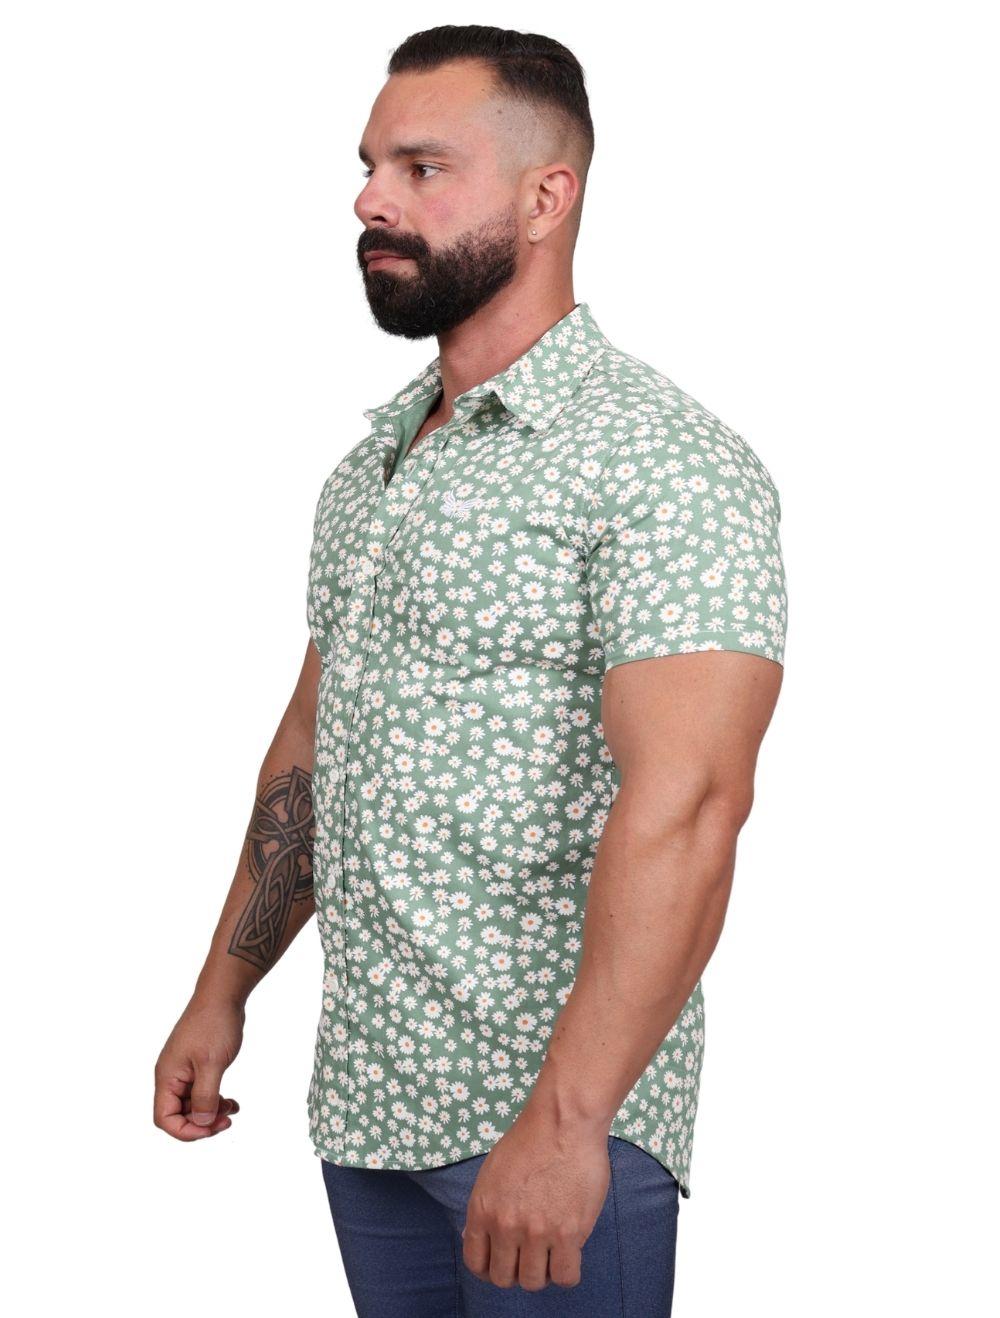 Camisa Masculina Slim Verde Estampa Margaridas